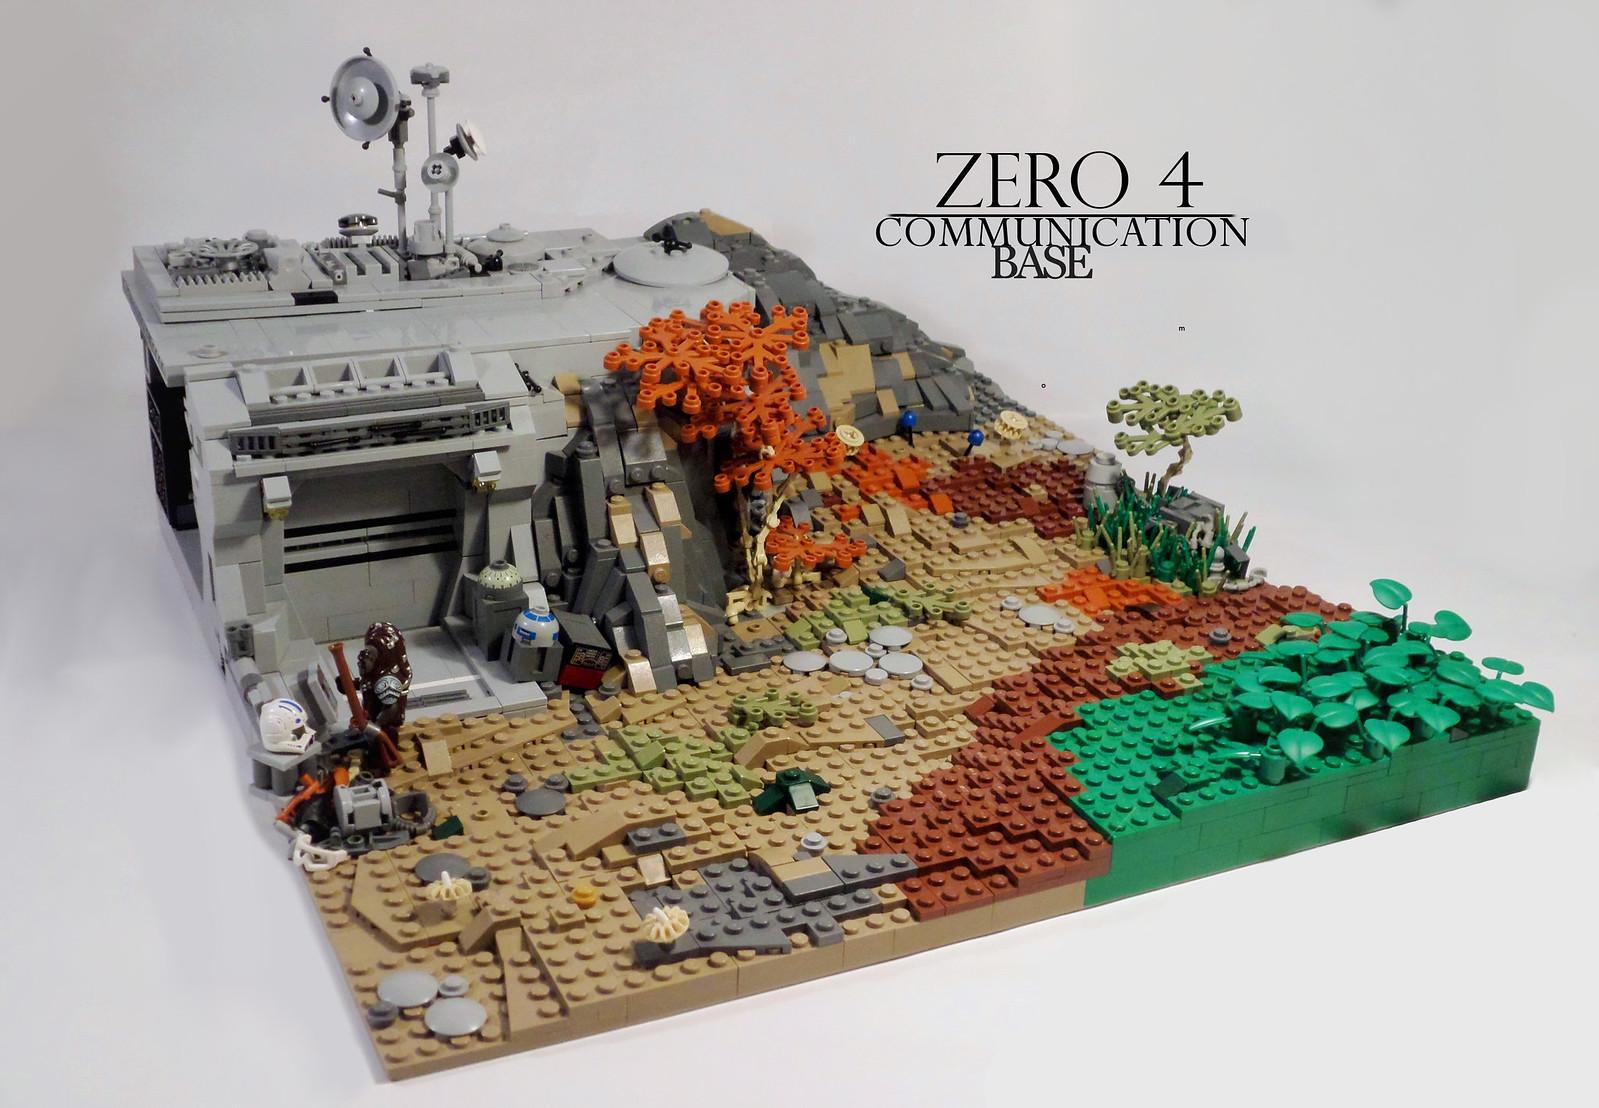 Corelian liberators 1.1 Comunation base Zero 4 (custom built Lego model)